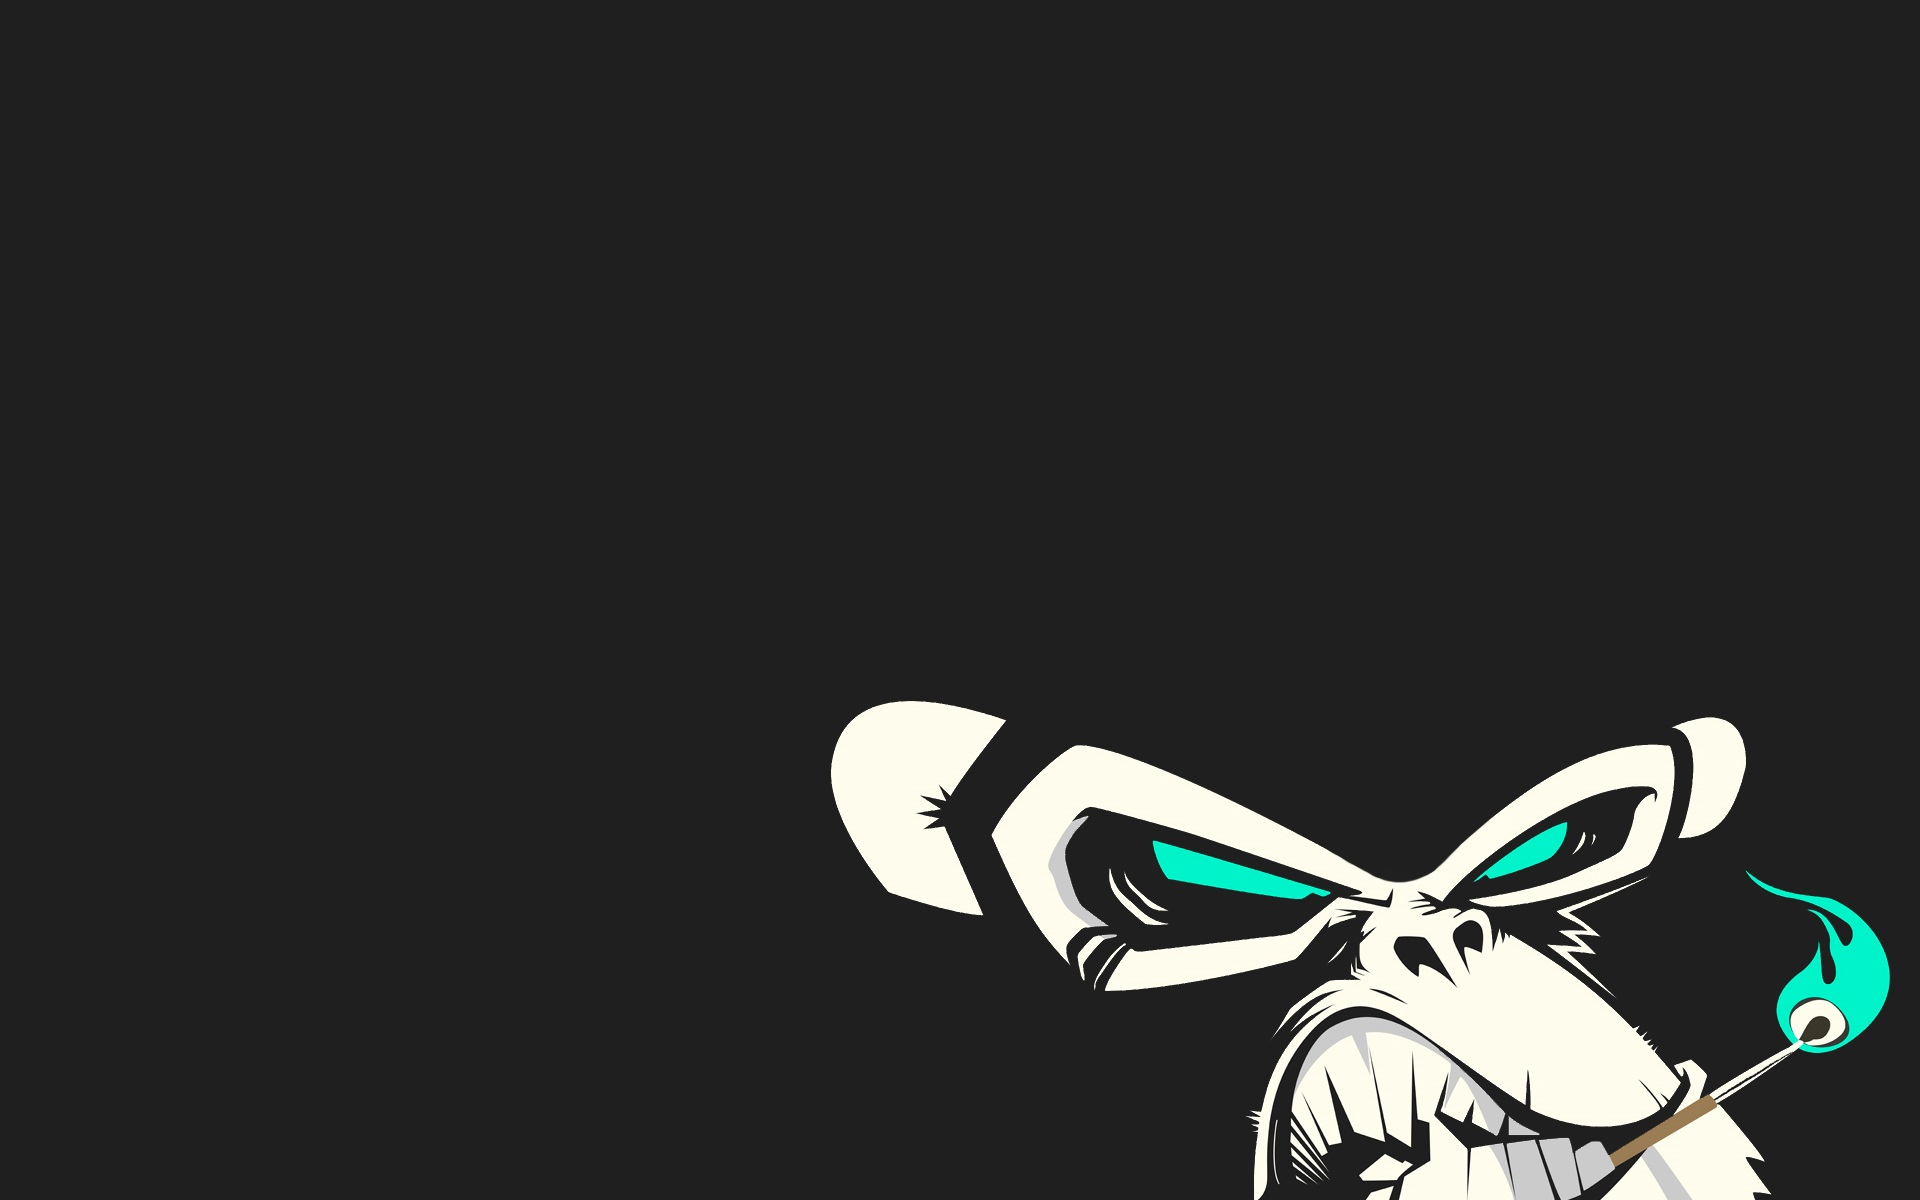 evil monkey cool desktop background share this cool desktop background 1920x1200